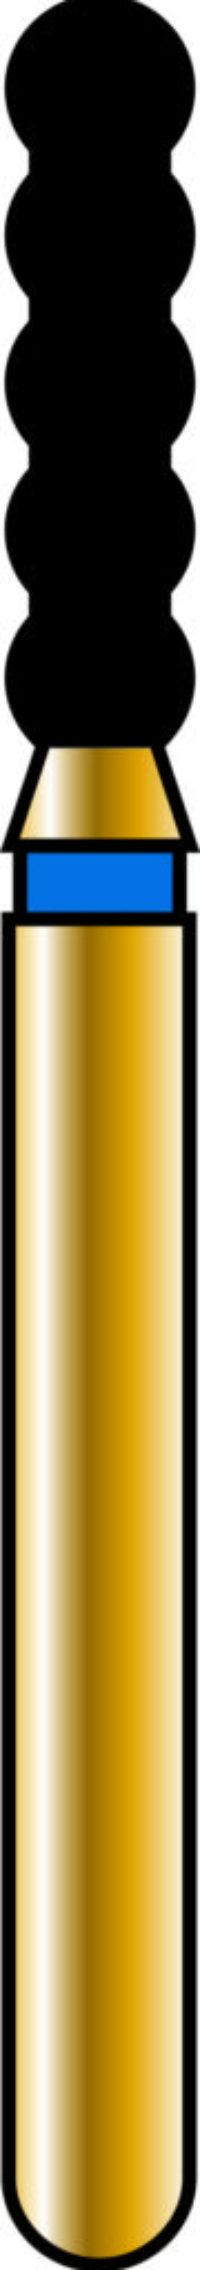 Cylinder 18-6mm Gold Diamond Bur